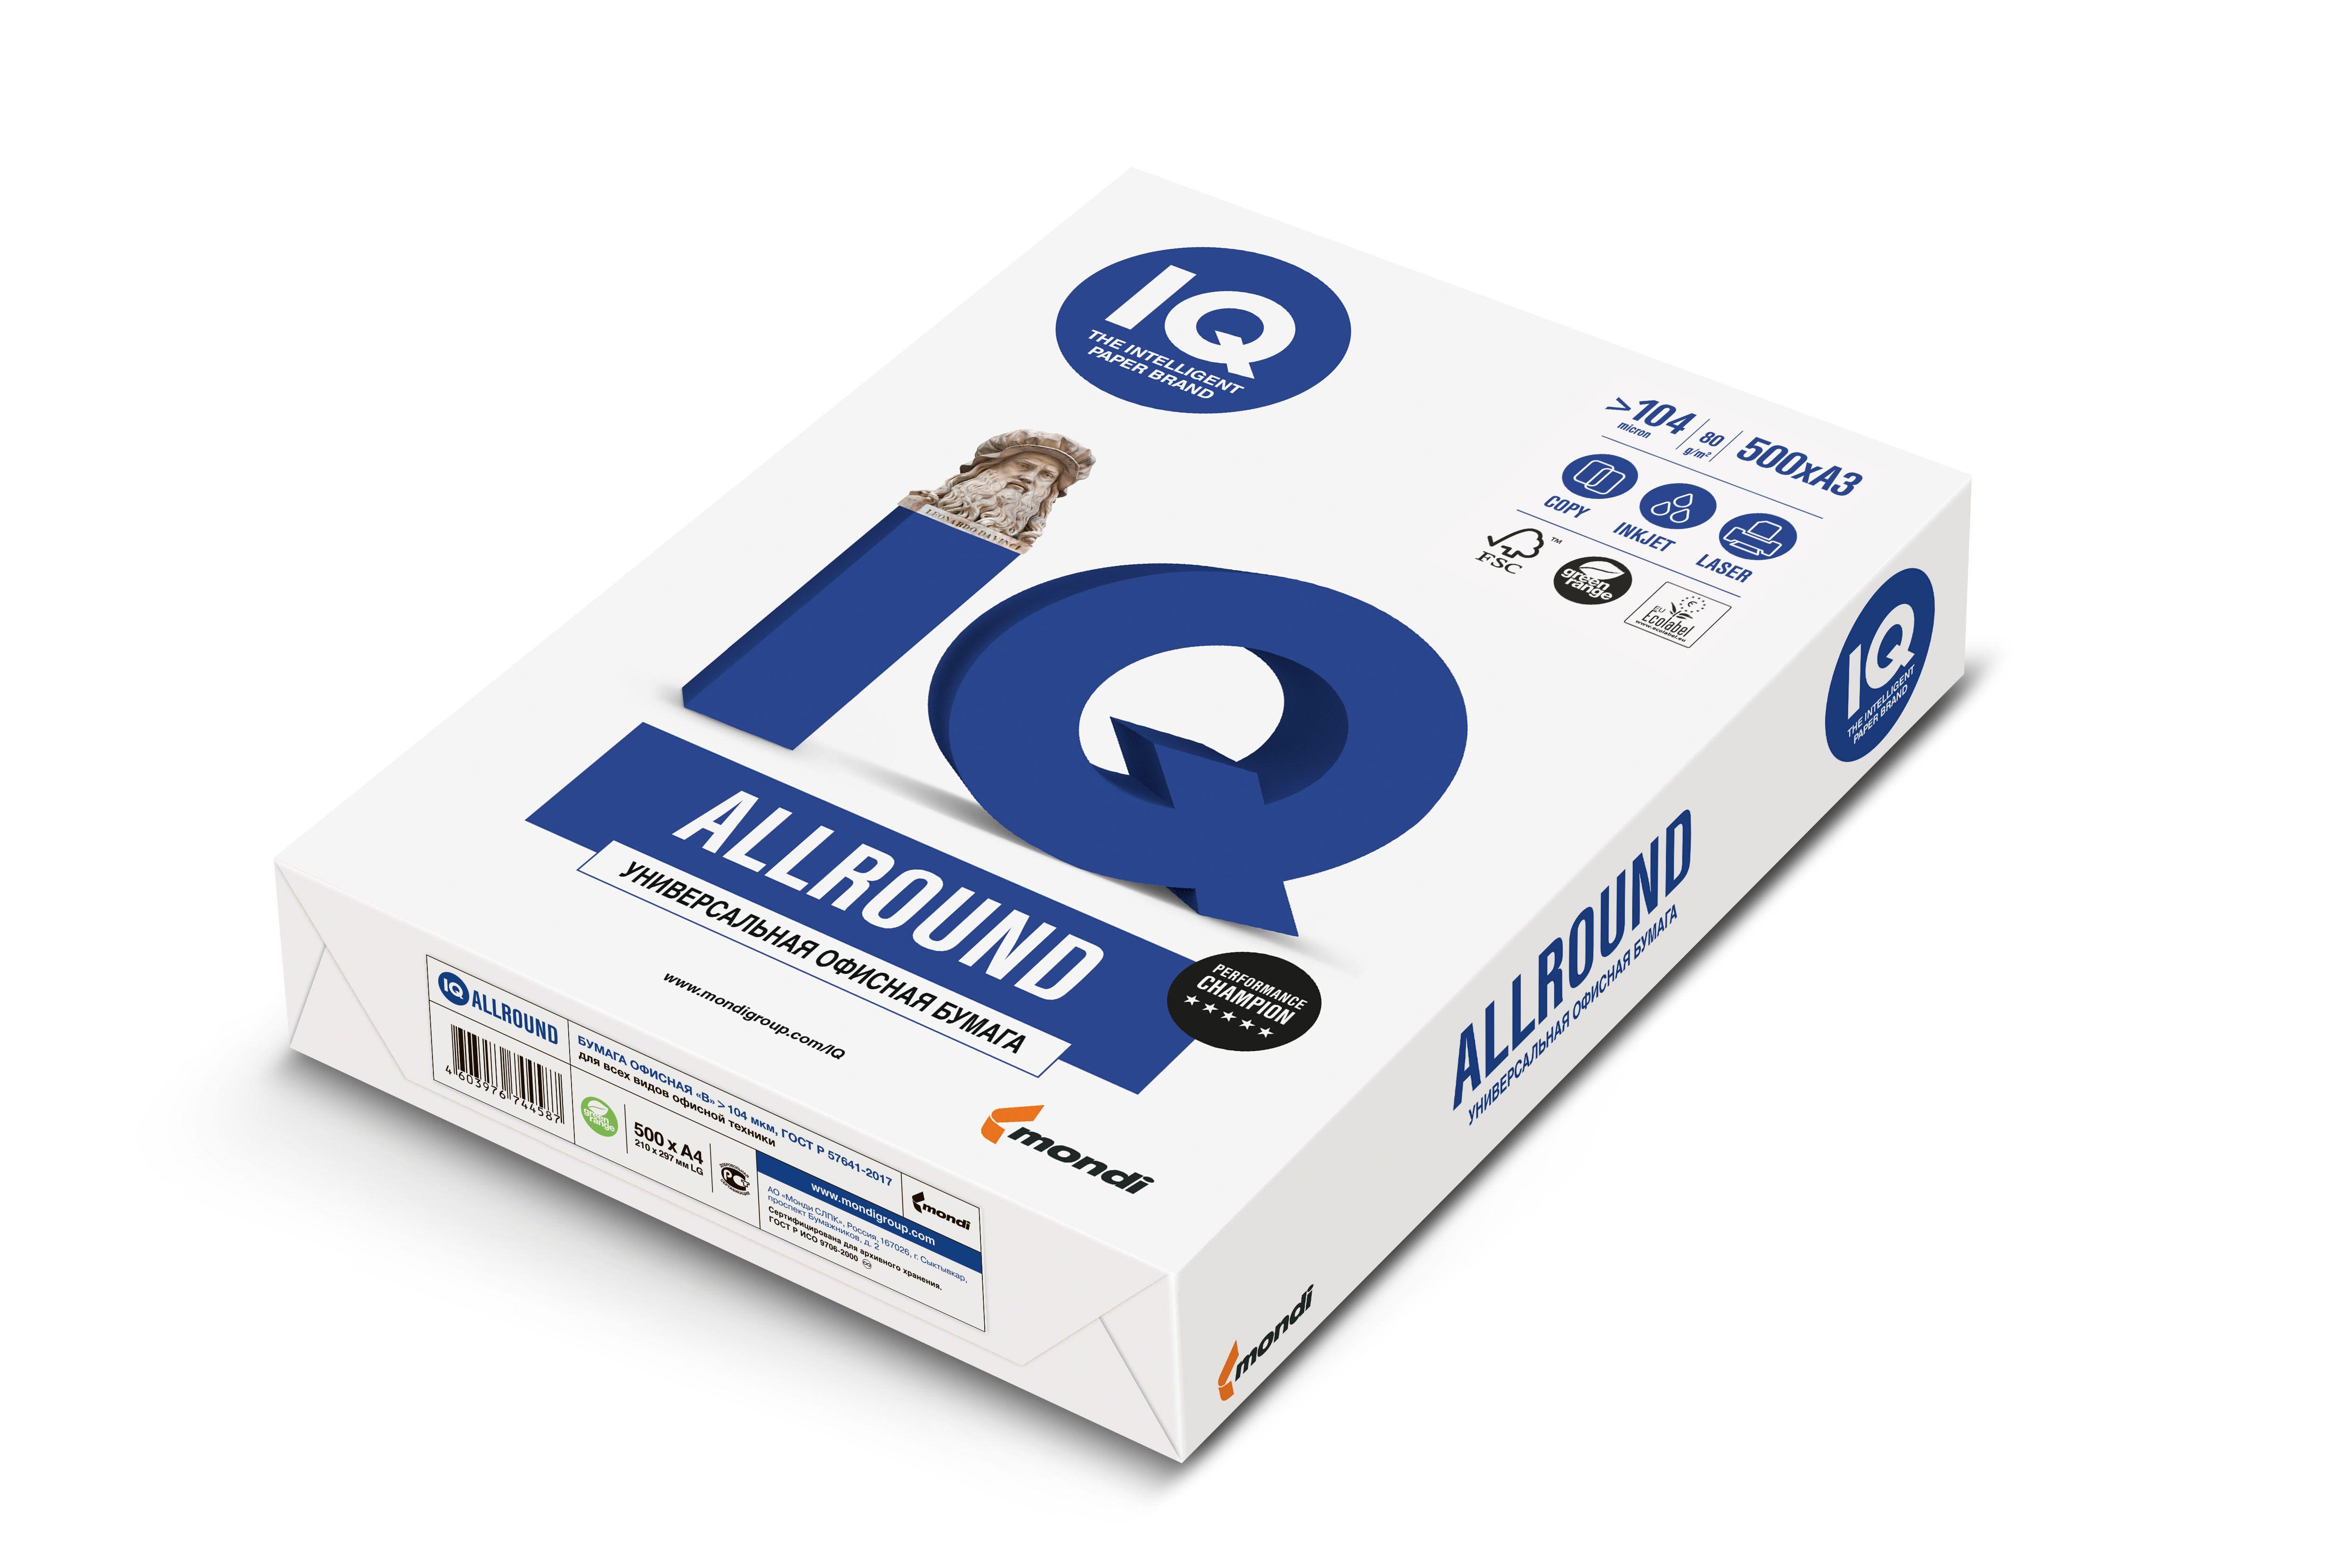 Бумага IQ ALLROUND А4, 80 г/м2, 500 листов, 162% (CIE)